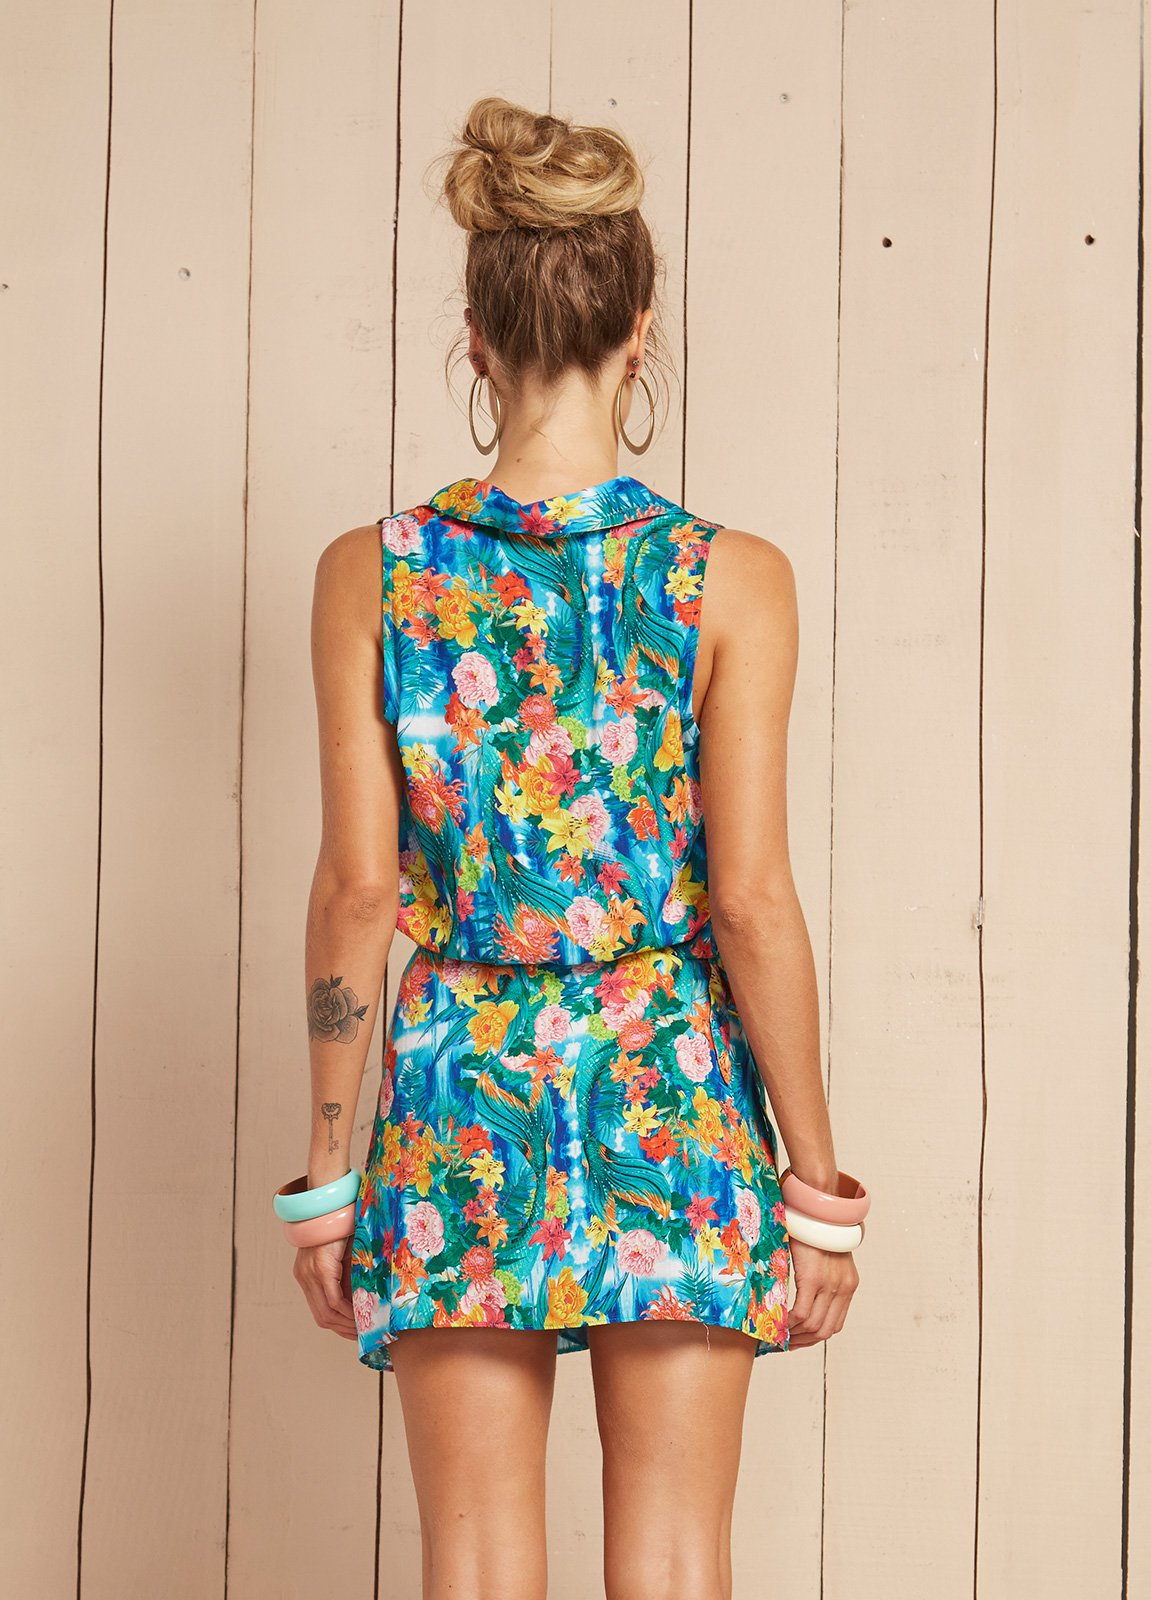 cf3cebeb9597 ... Short sleeveless floral beach dress - VESTIDO DORA ...